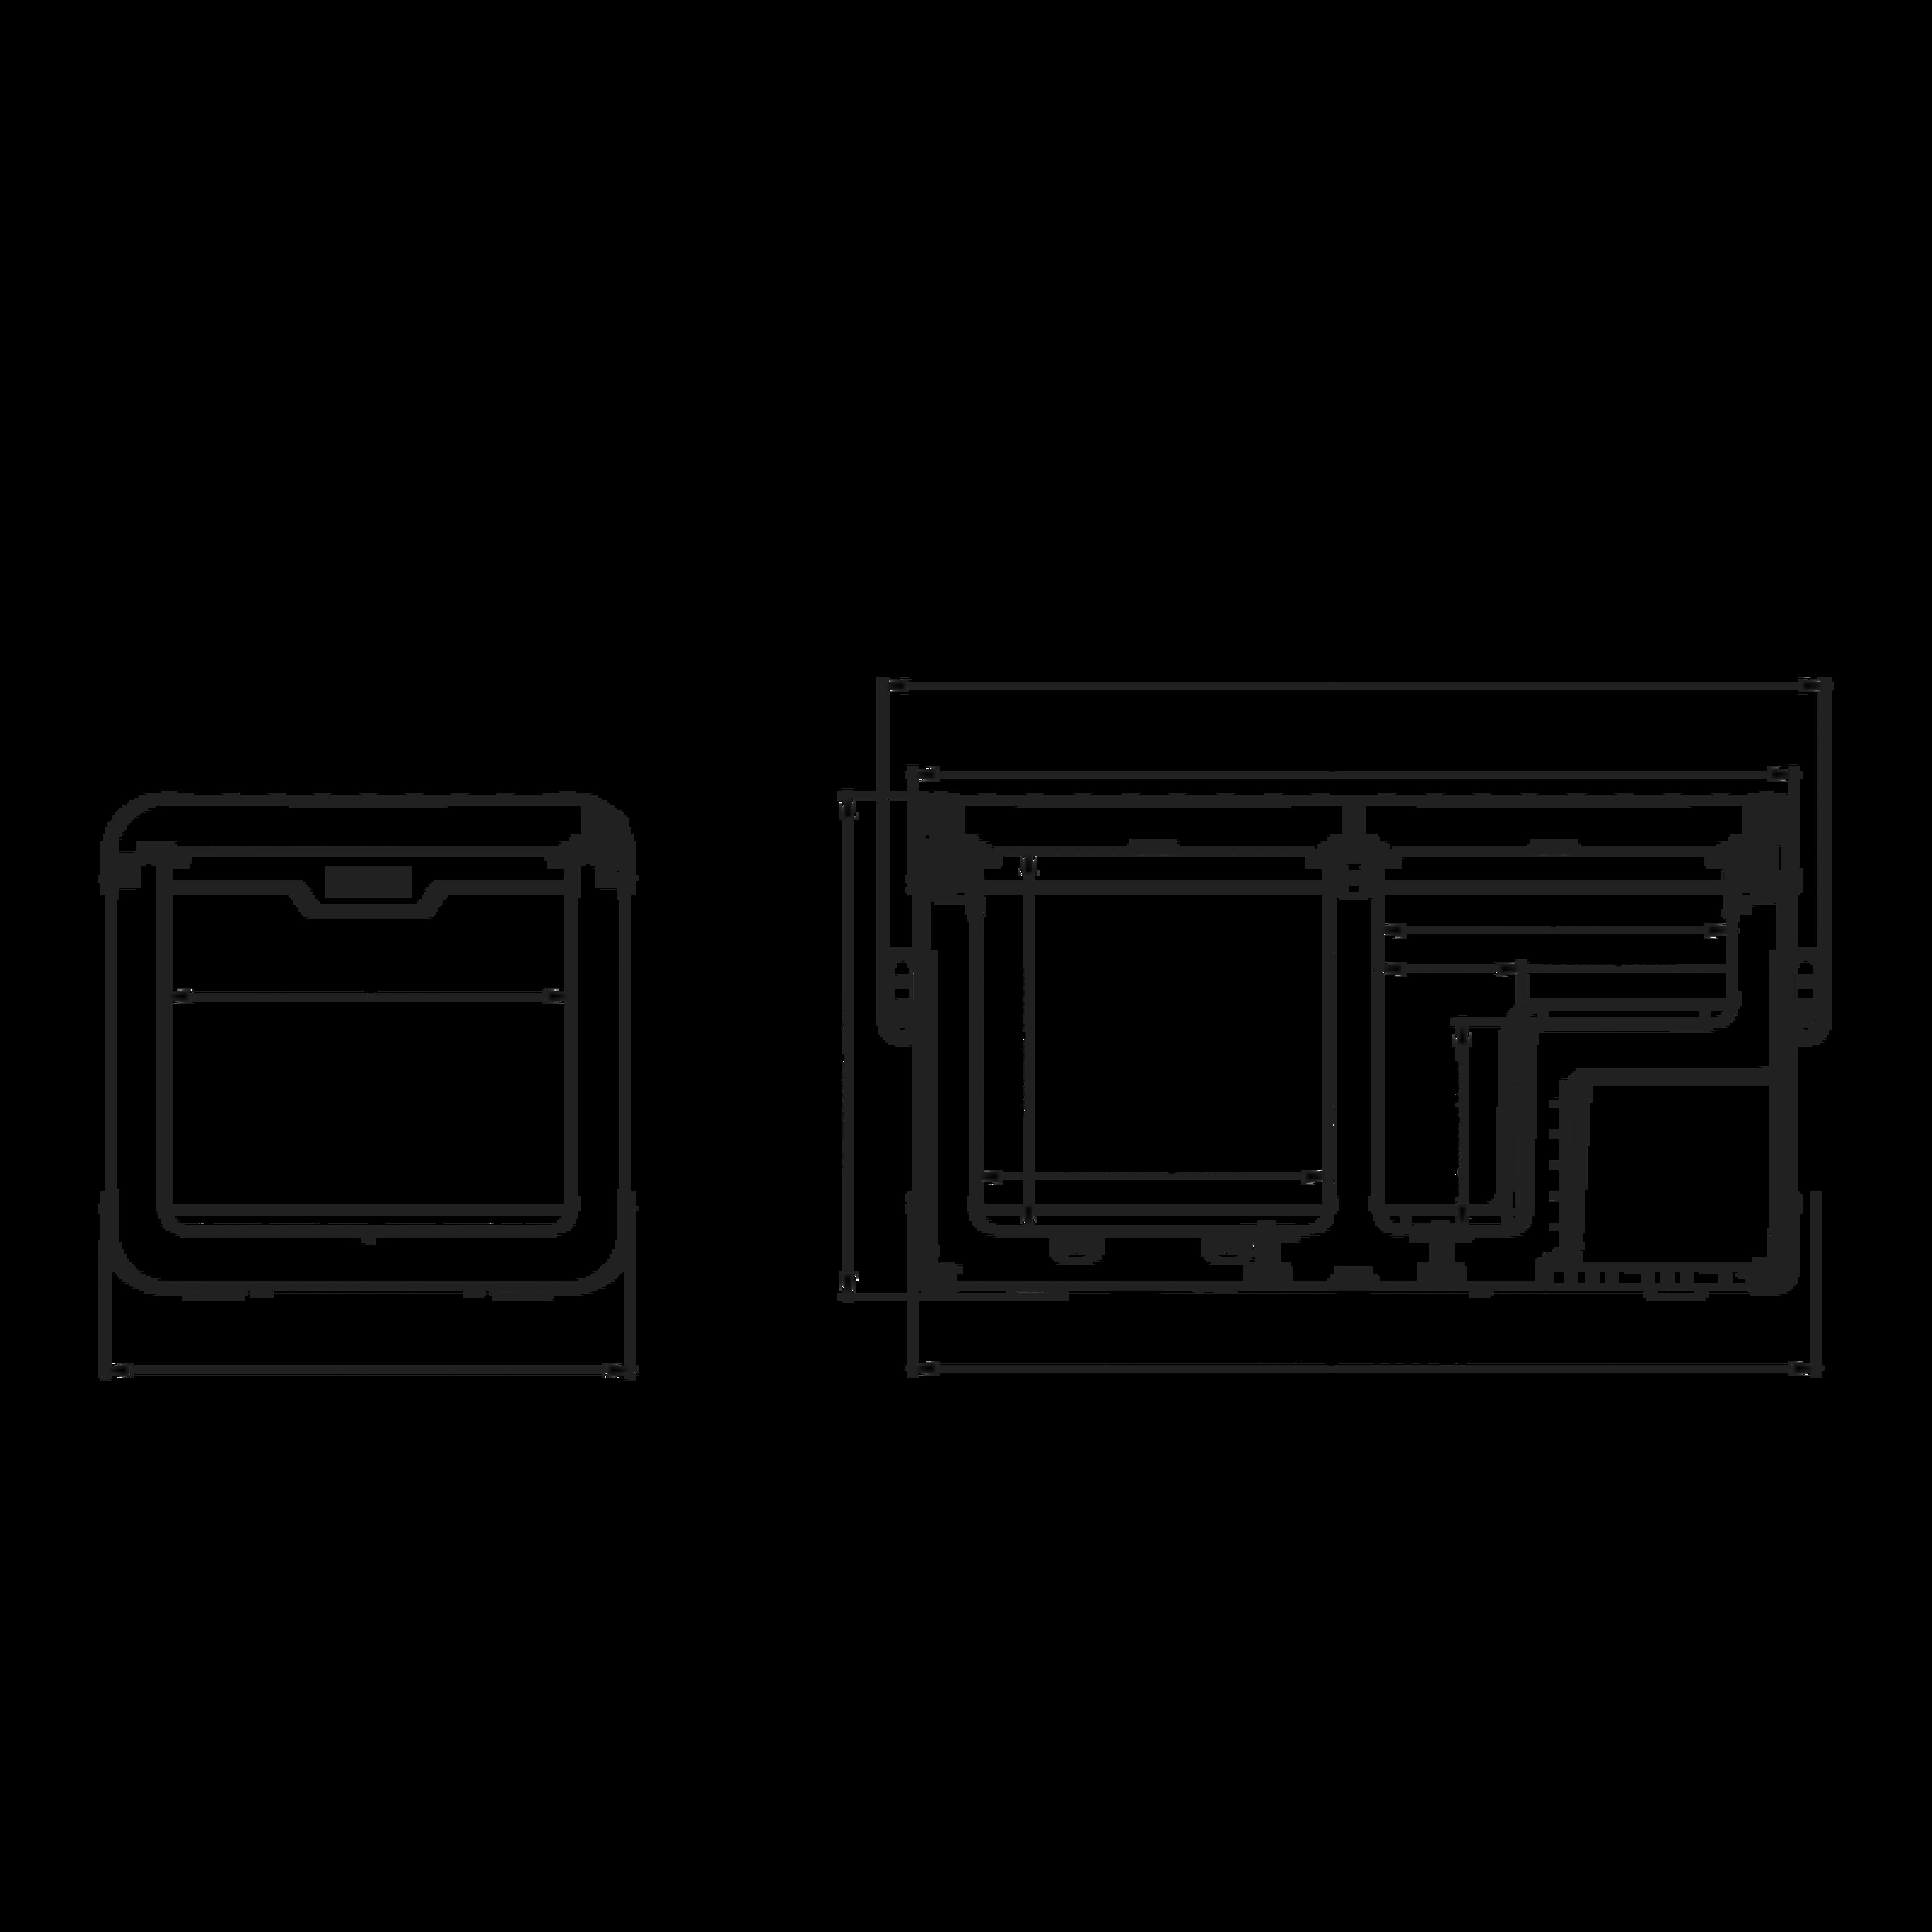 CFX 75DZW Dimensions